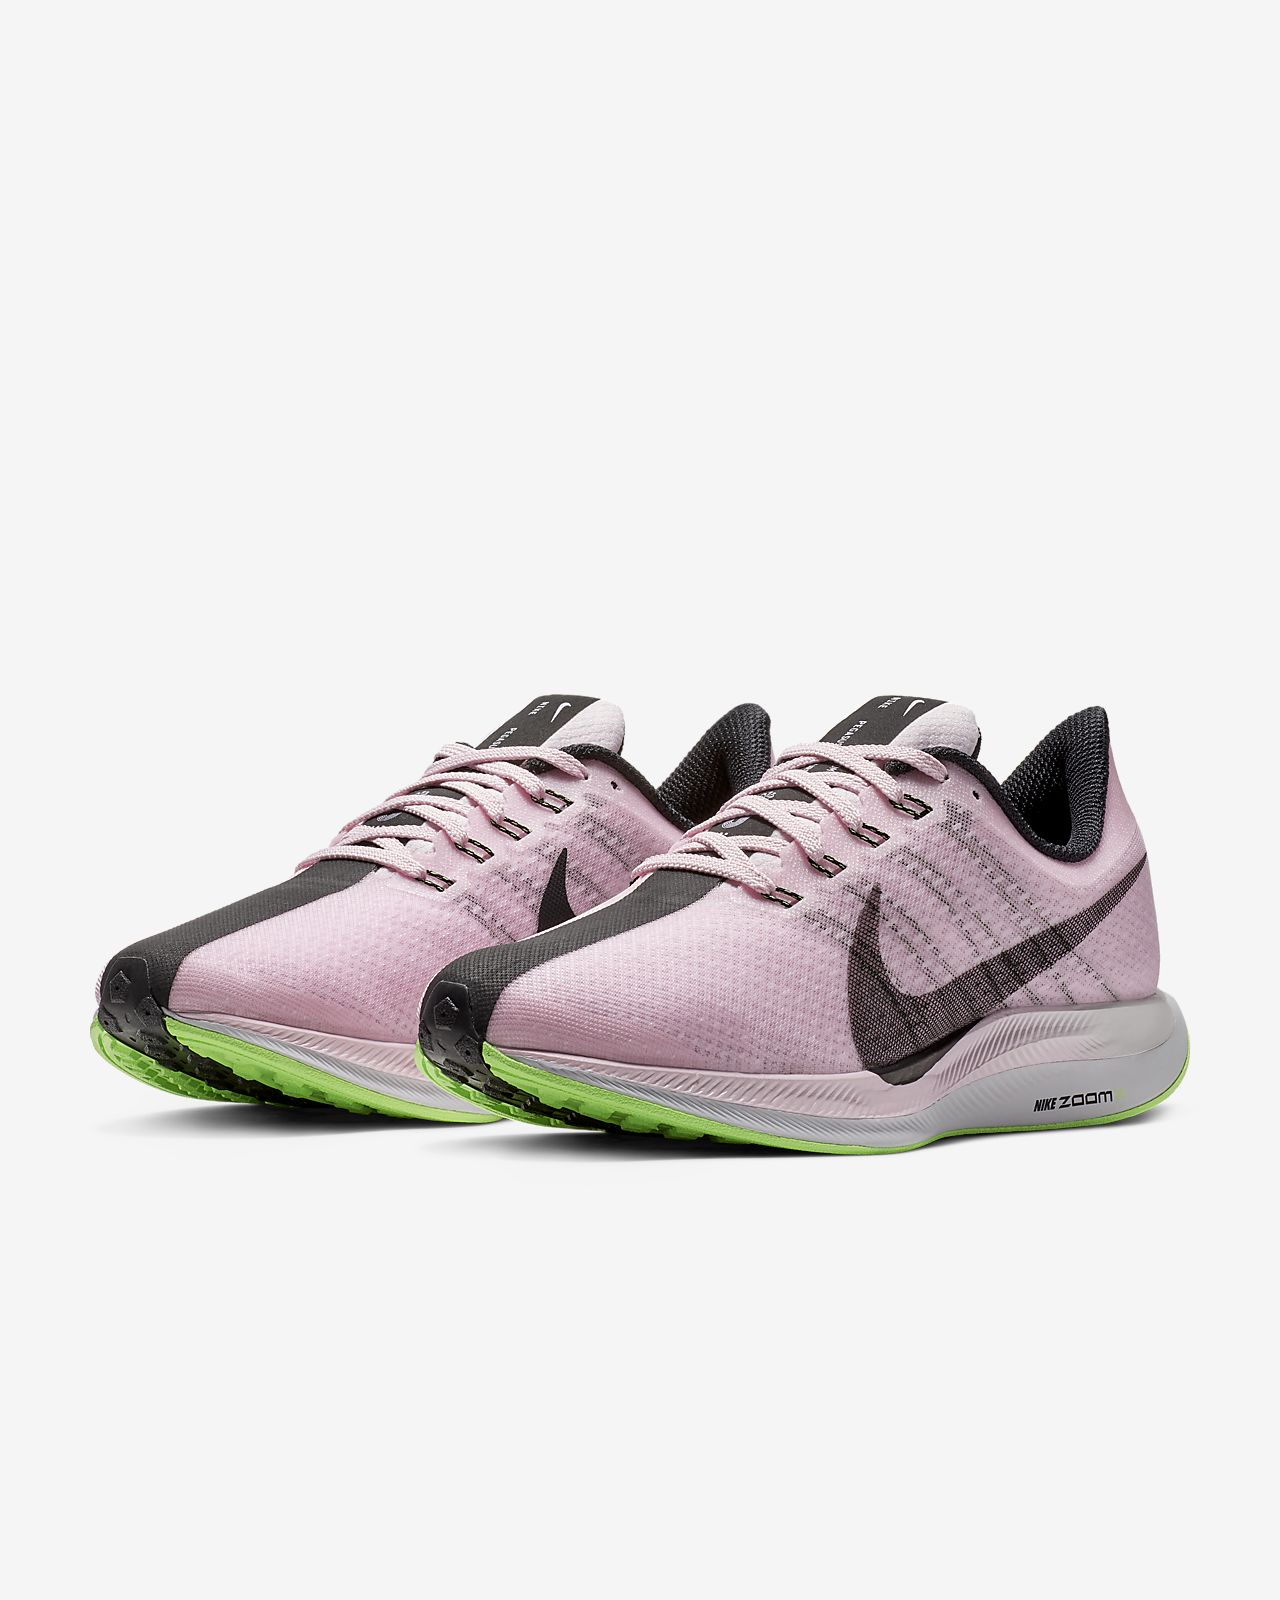 272f73d914d80 Chaussure de running Nike Zoom Pegasus Turbo pour Femme. Nike.com BE